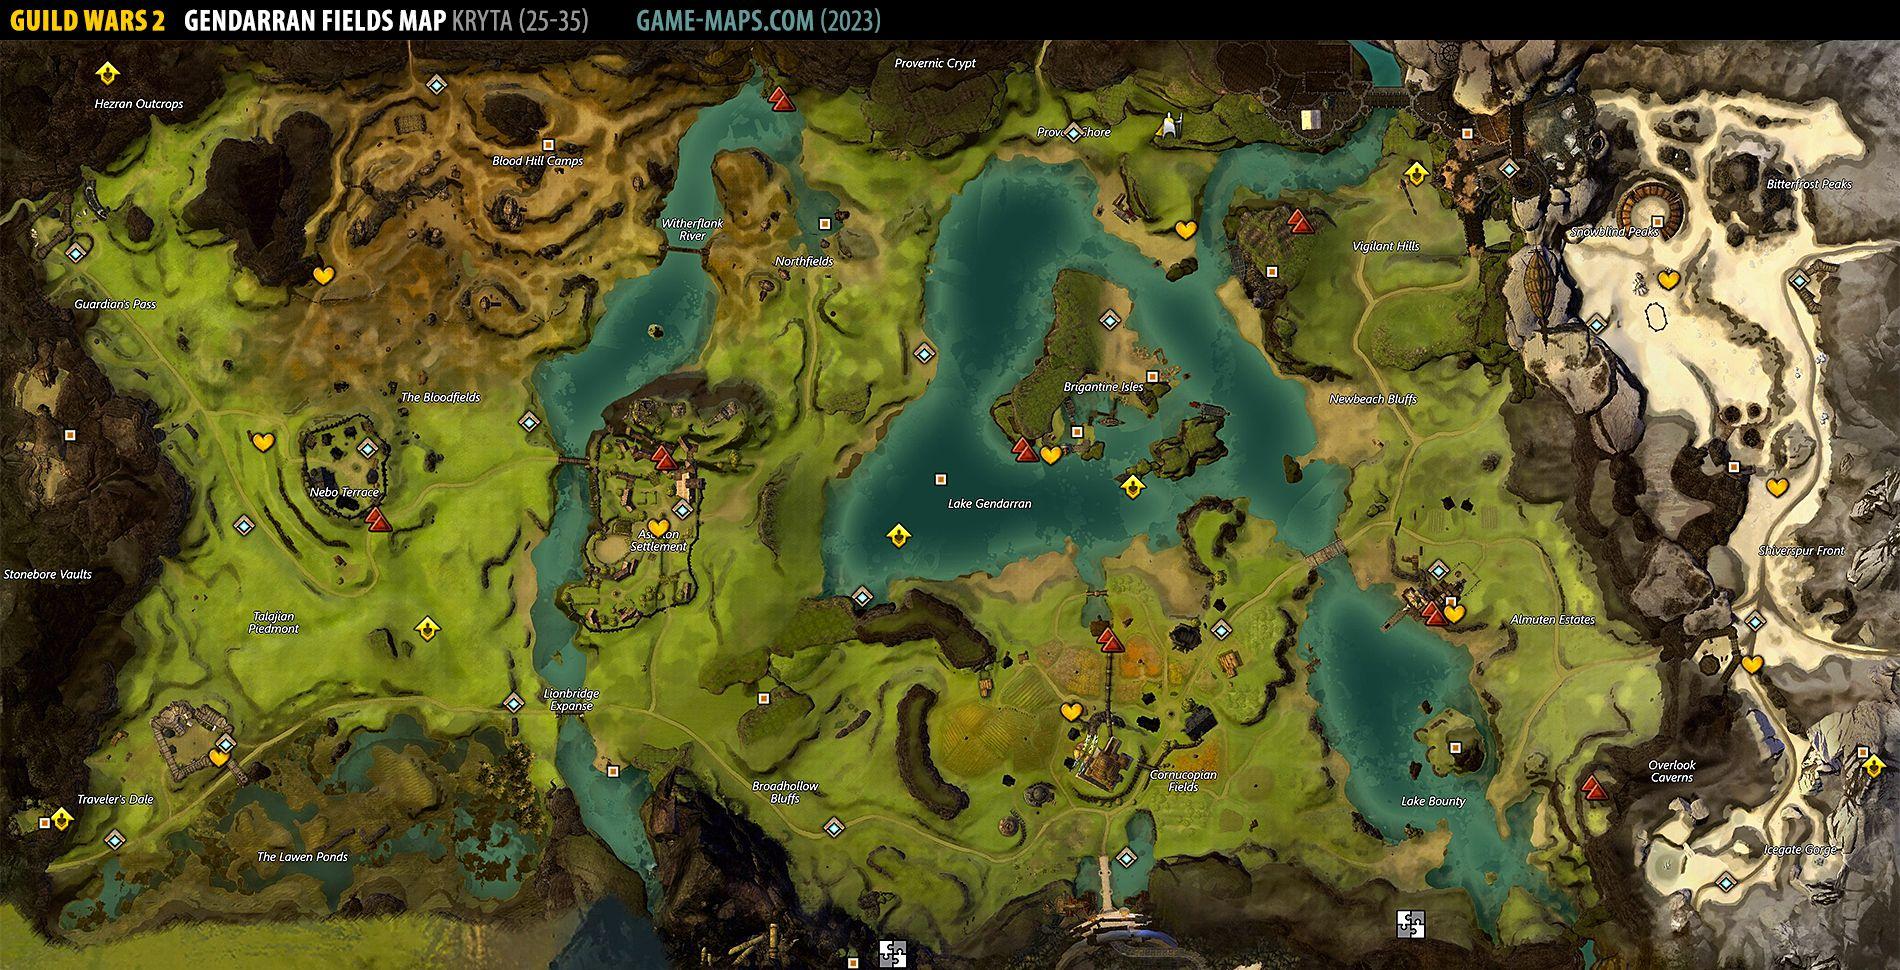 Gendarran Fields Map 2019 Guild Wars 2 Game Maps Com